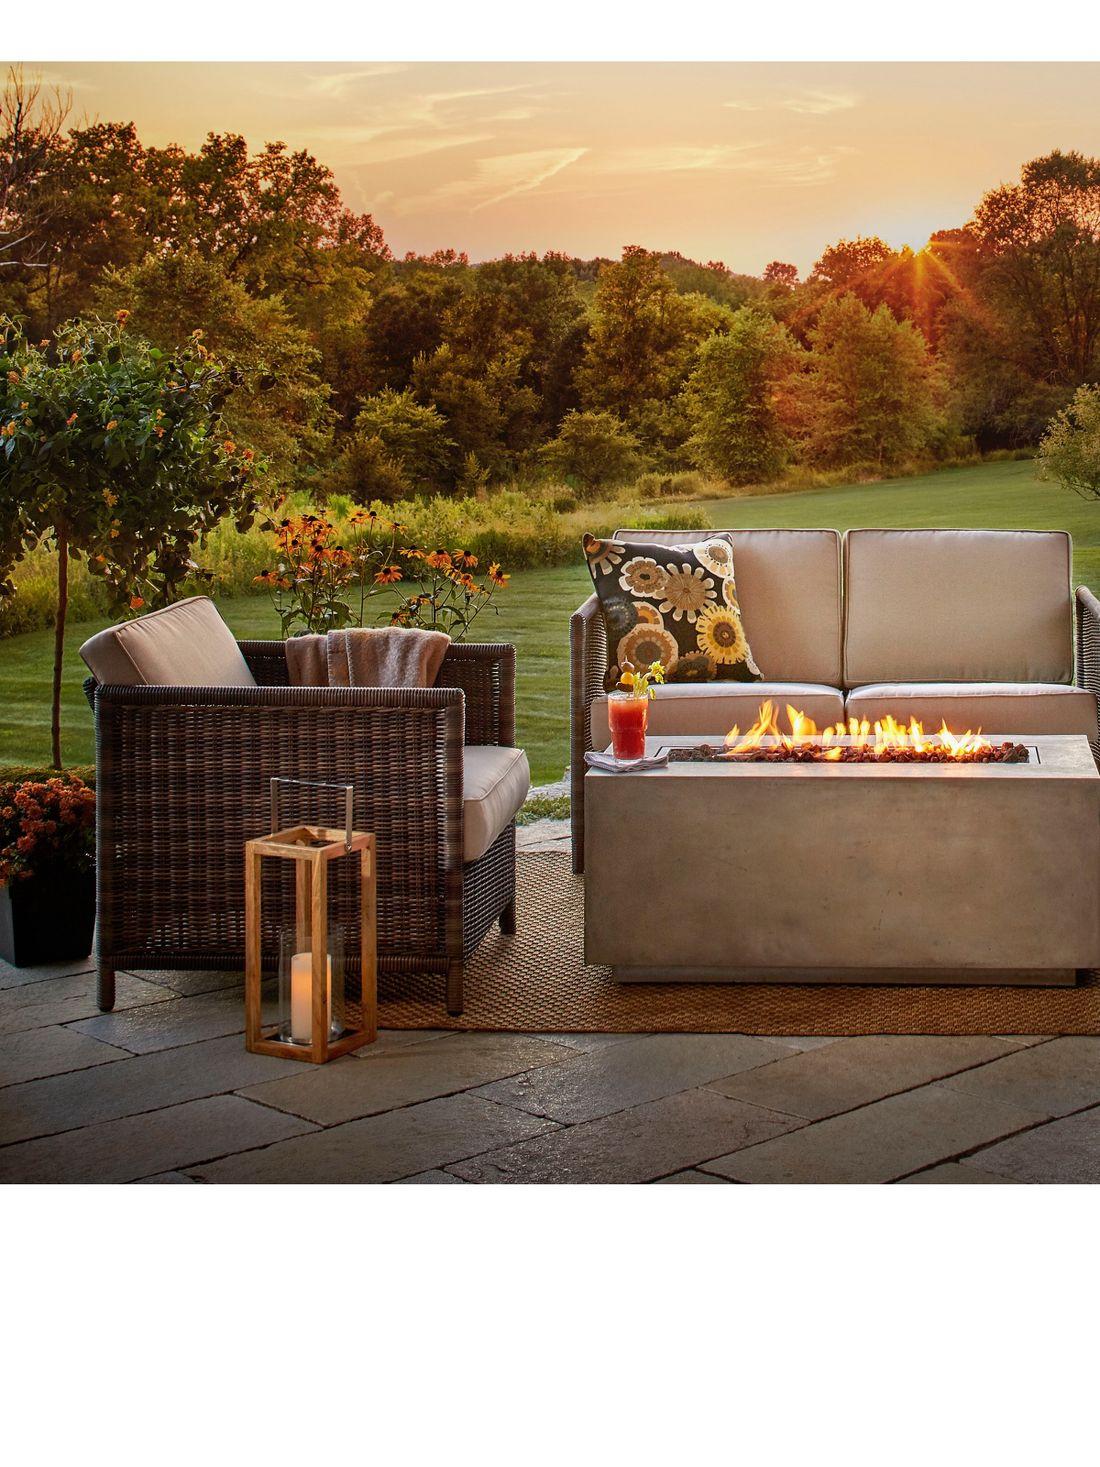 Rustic Decor & Furniture : Target